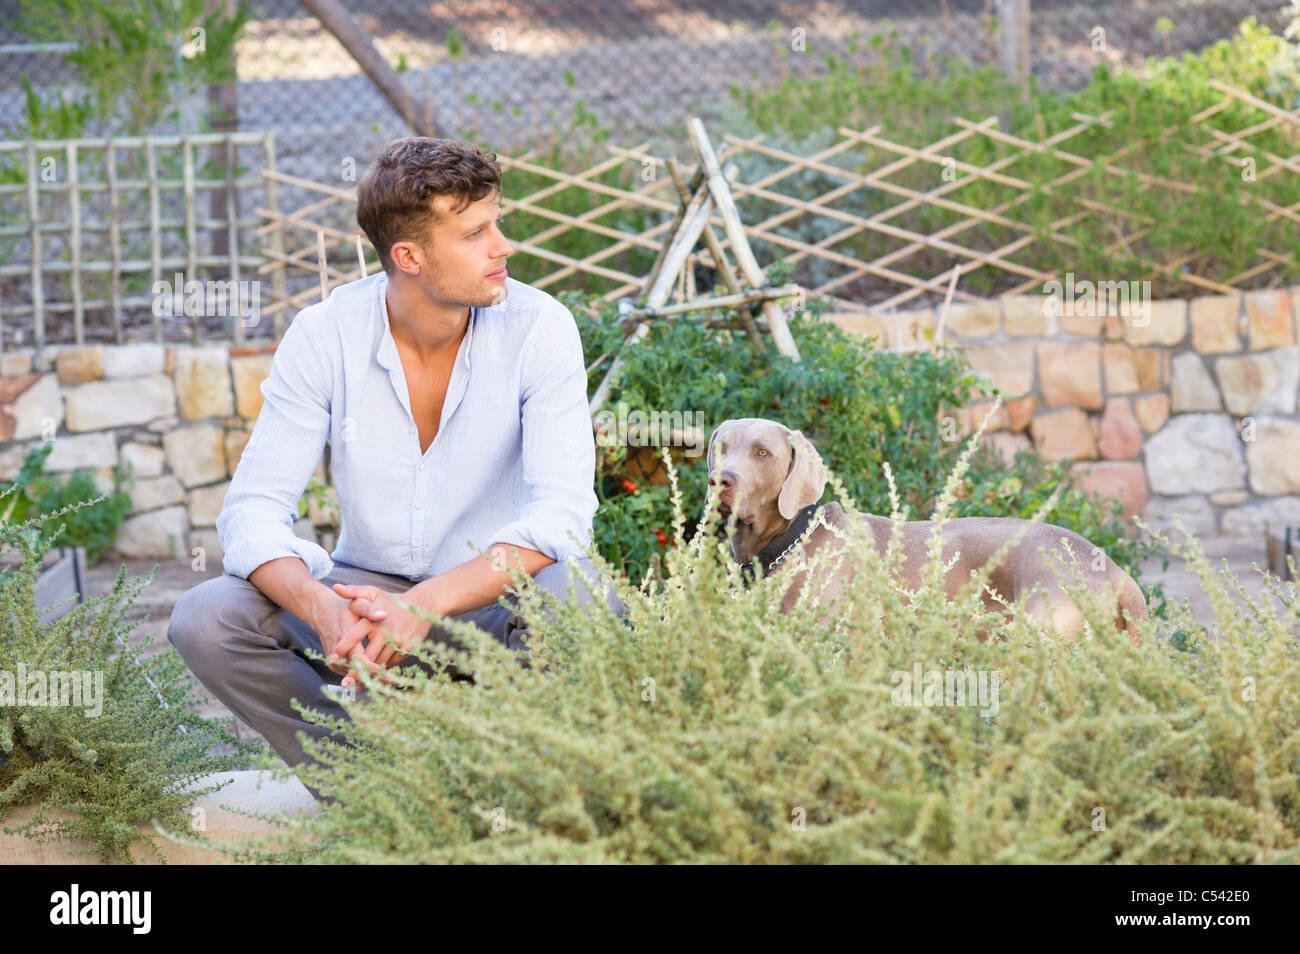 Contemplative man with a dog in garden Stock Photo